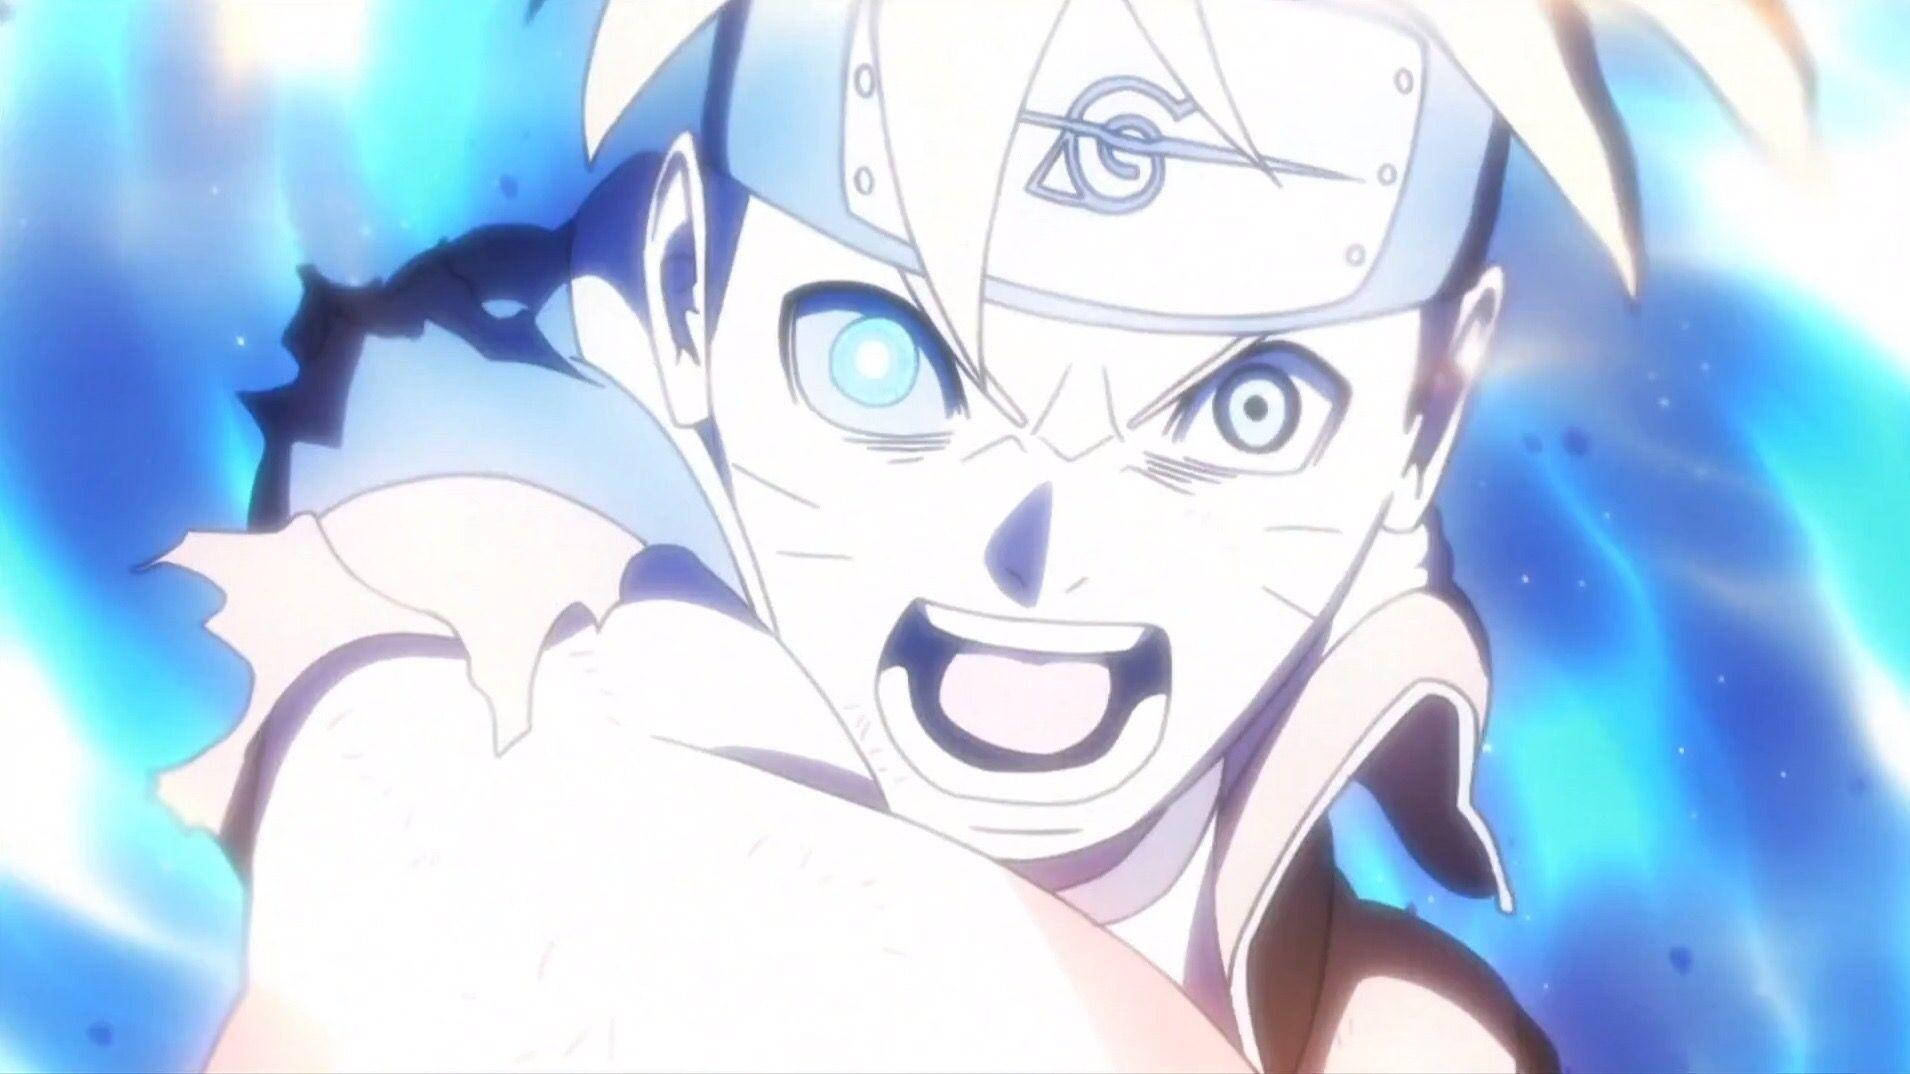 naruto / boruto ⁎⁺˳ ༚」おしゃれまとめの人気アイデア Pinterest ♡ ! アニメ